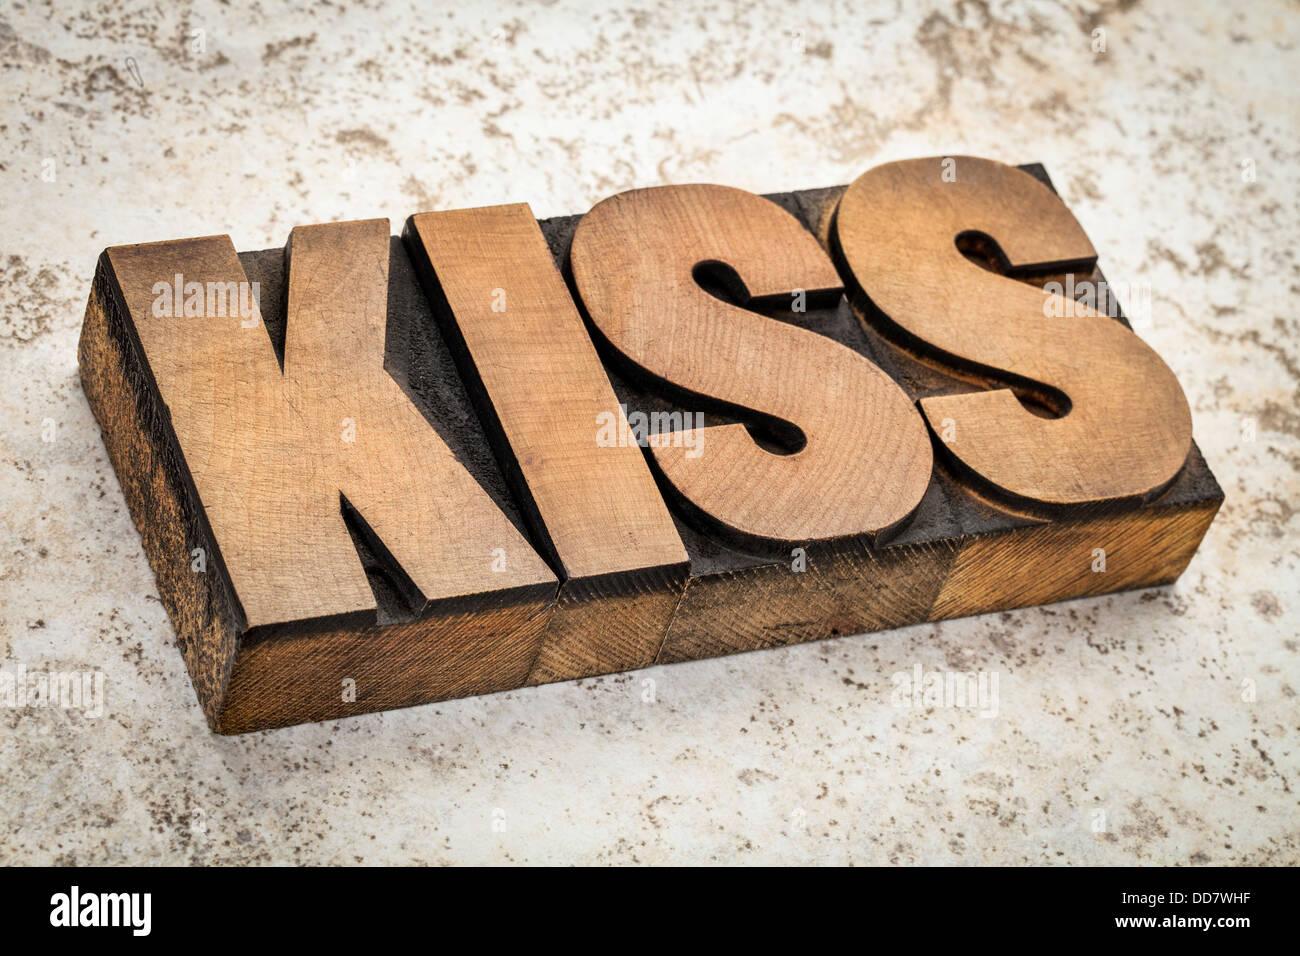 Palabra o acrónimo KISS (Keep It Simple Stupid) en tipografía tipo de madera contra baldosas cerámicas Imagen De Stock